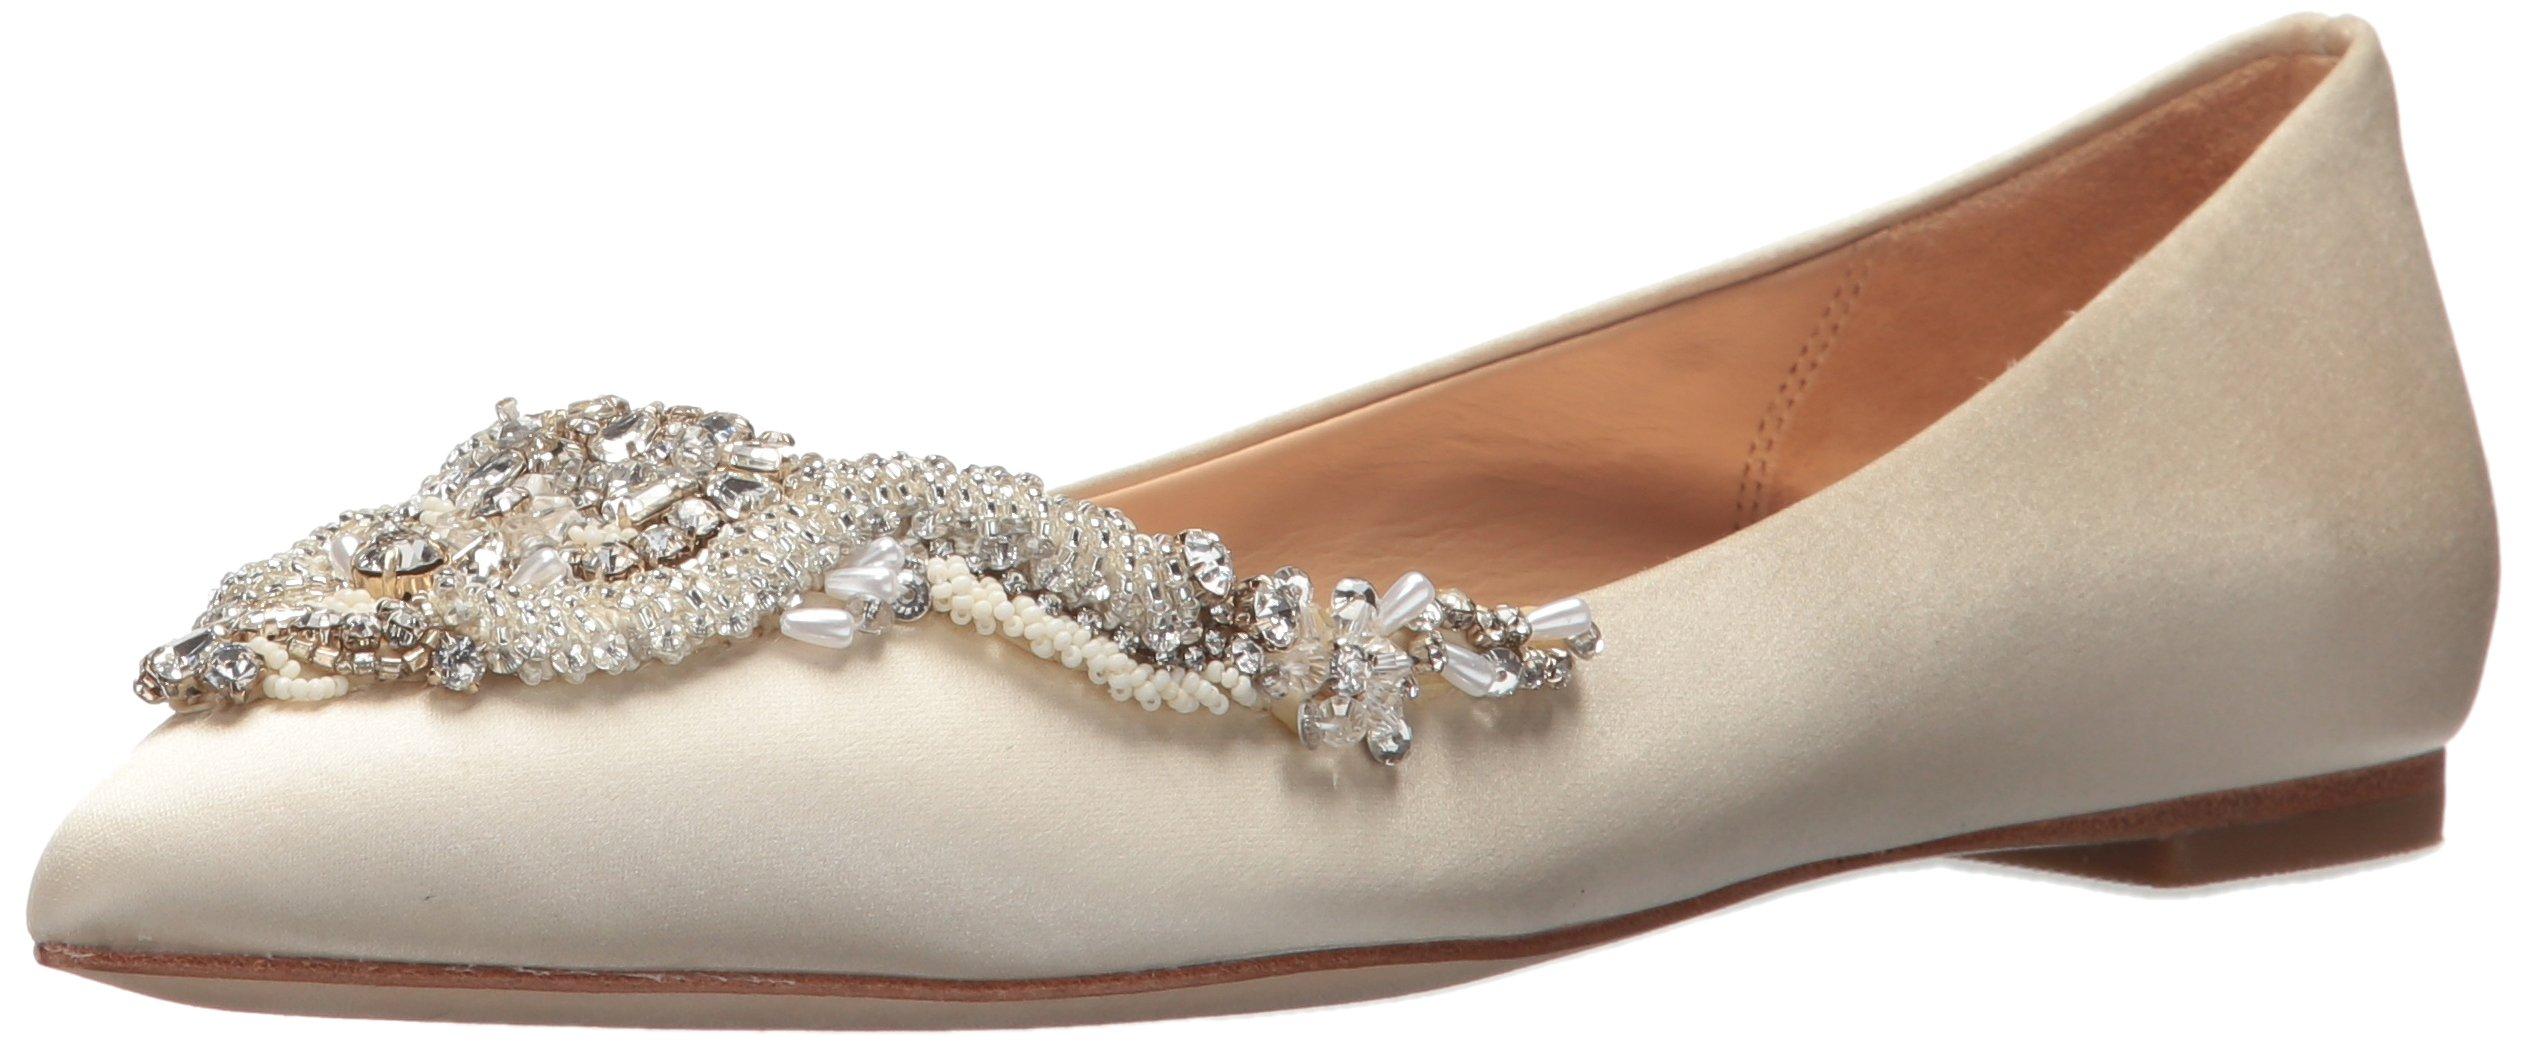 Badgley Mischka Women's Malena Ballet Flat, Ivory, 9 M US